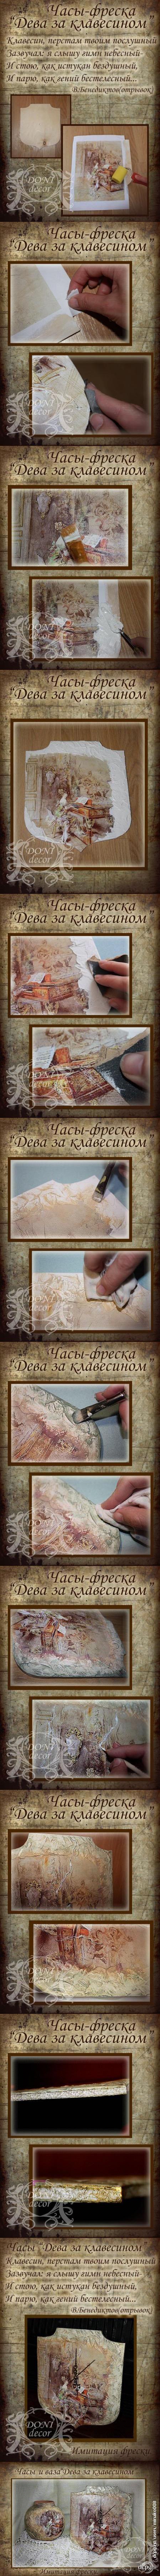 "Декупаж - Сайт любителей декупажа - DCPG.RU | Лампа ""Мишки Тедди"""